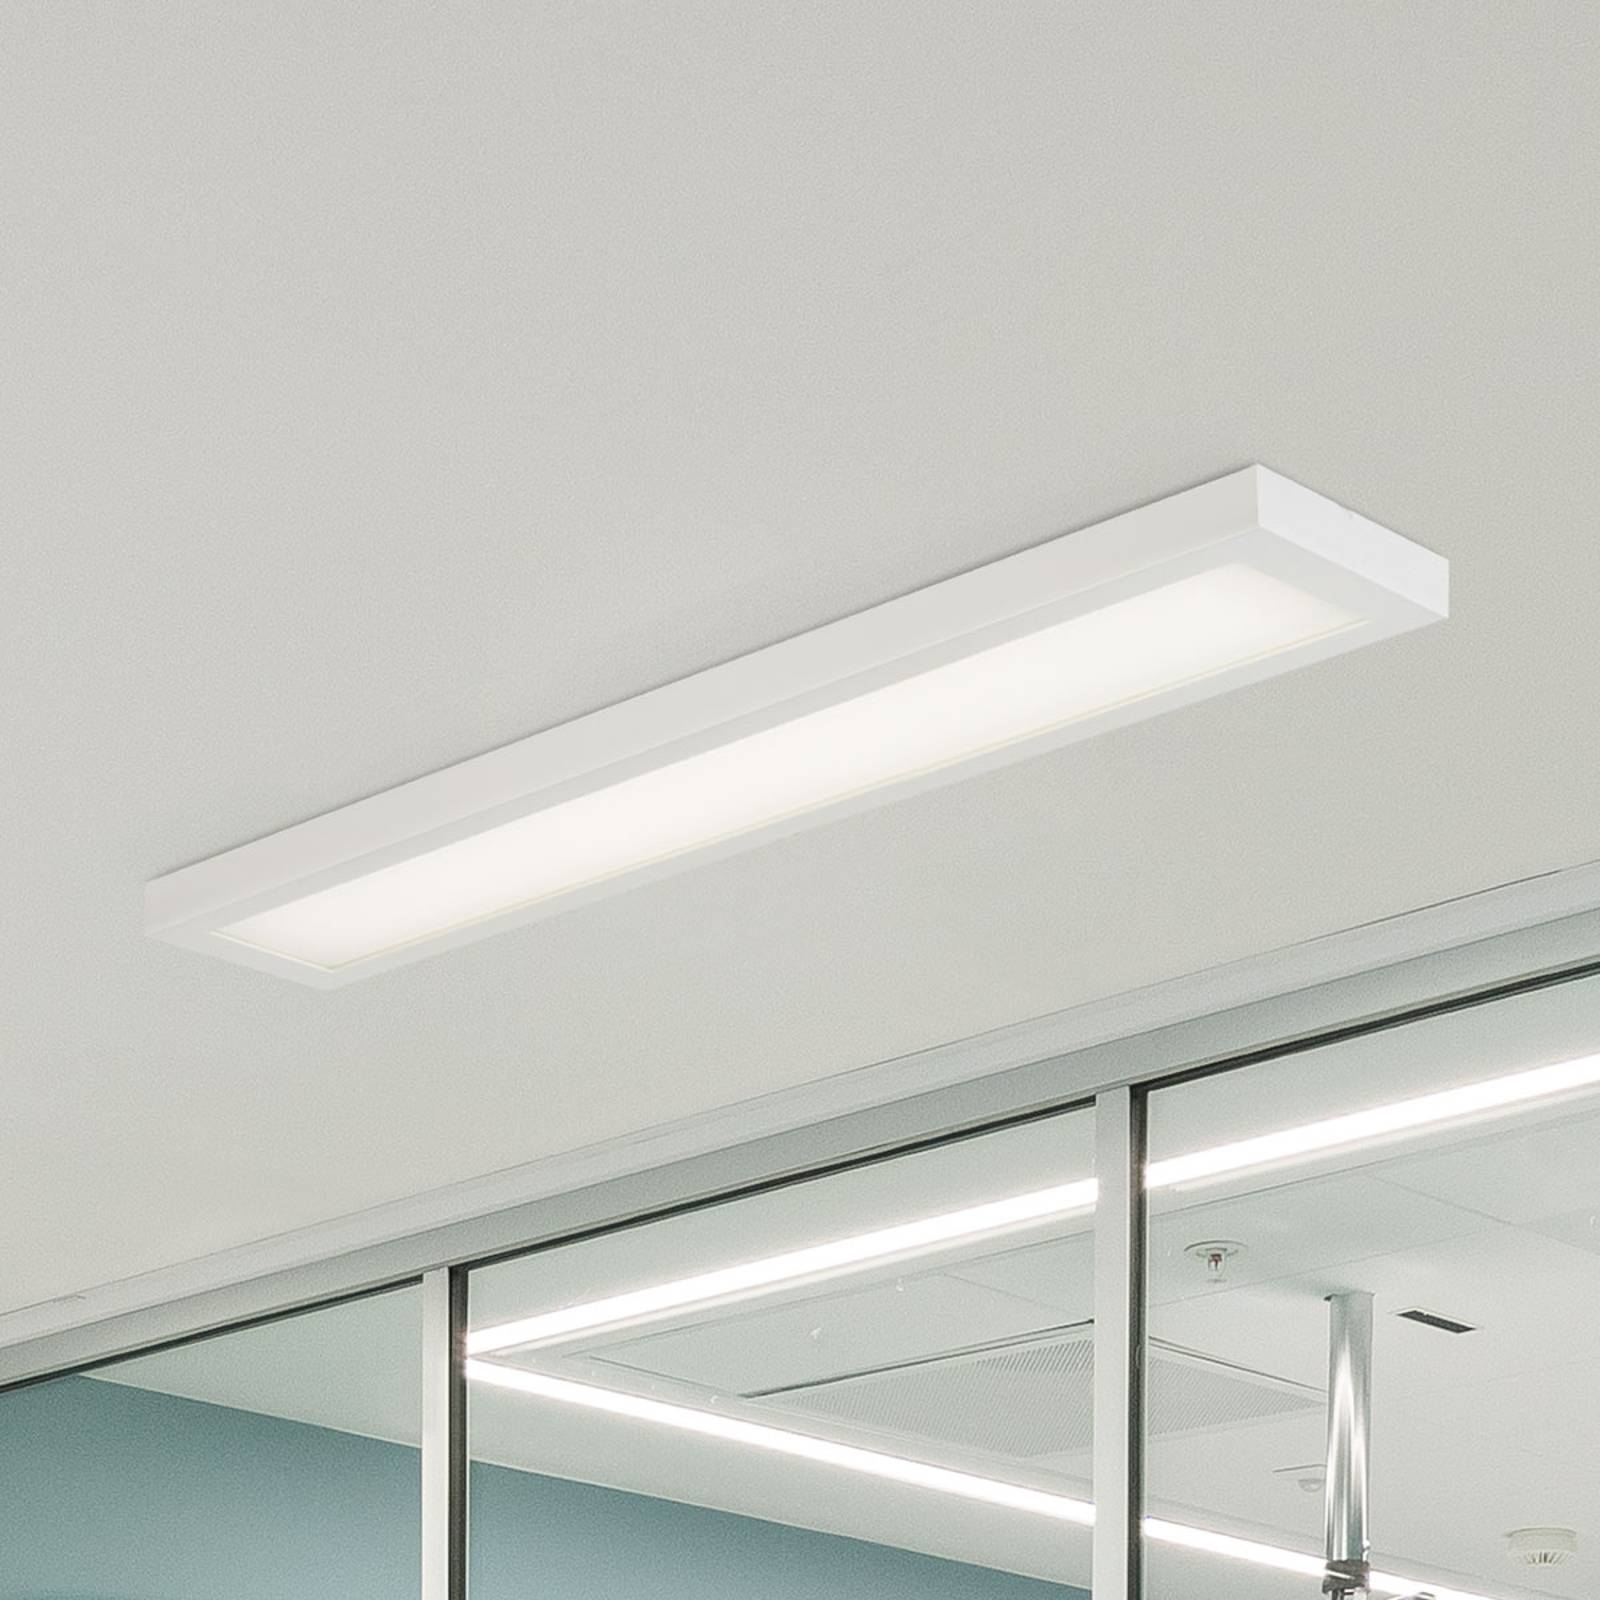 LED-Deckenleuchte C70-S MP HF 117x27cm 4.212lm 840